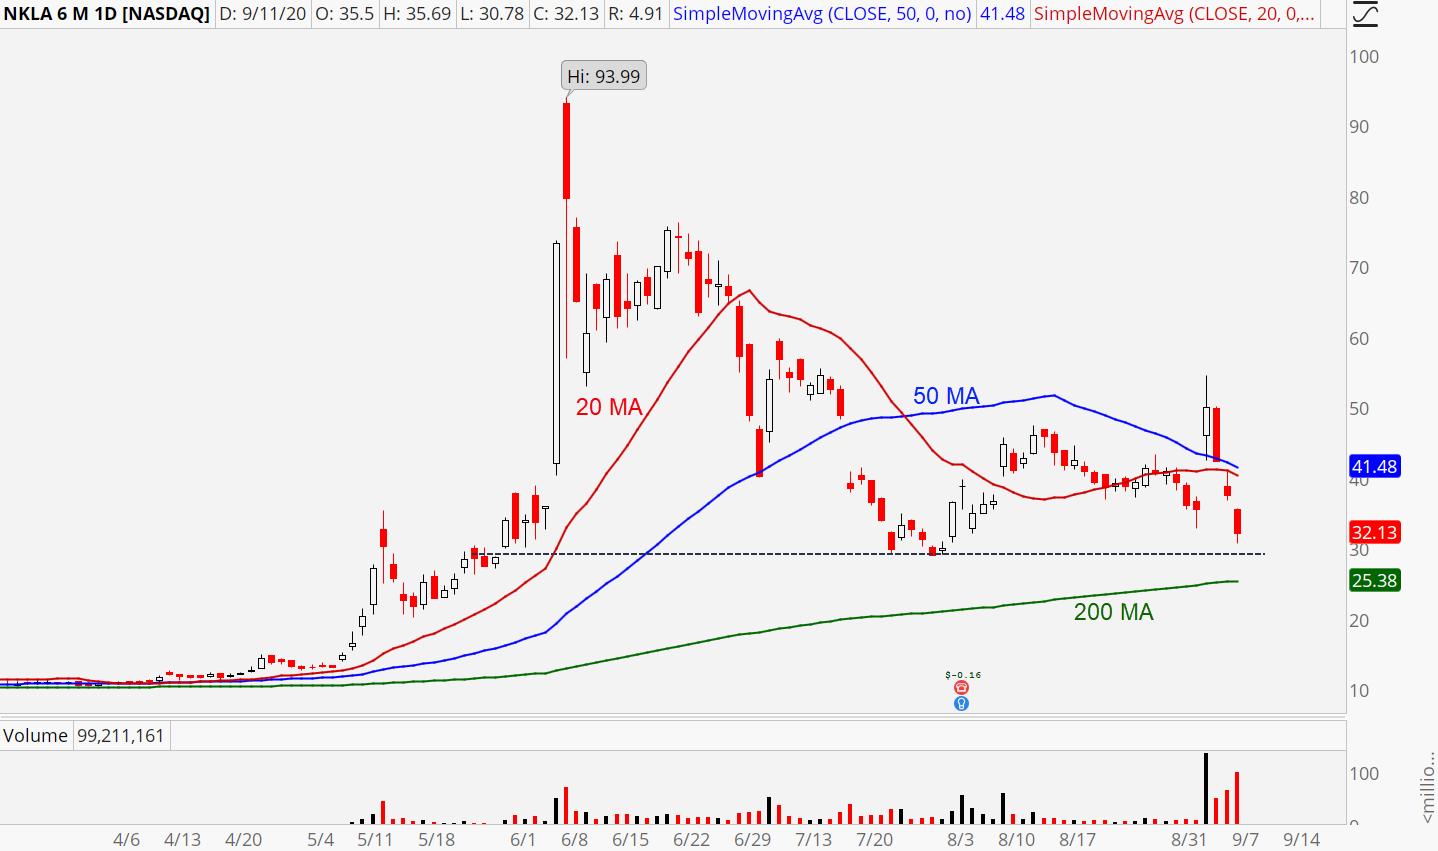 Nikola (NKLA) stock chart showing potential support zones